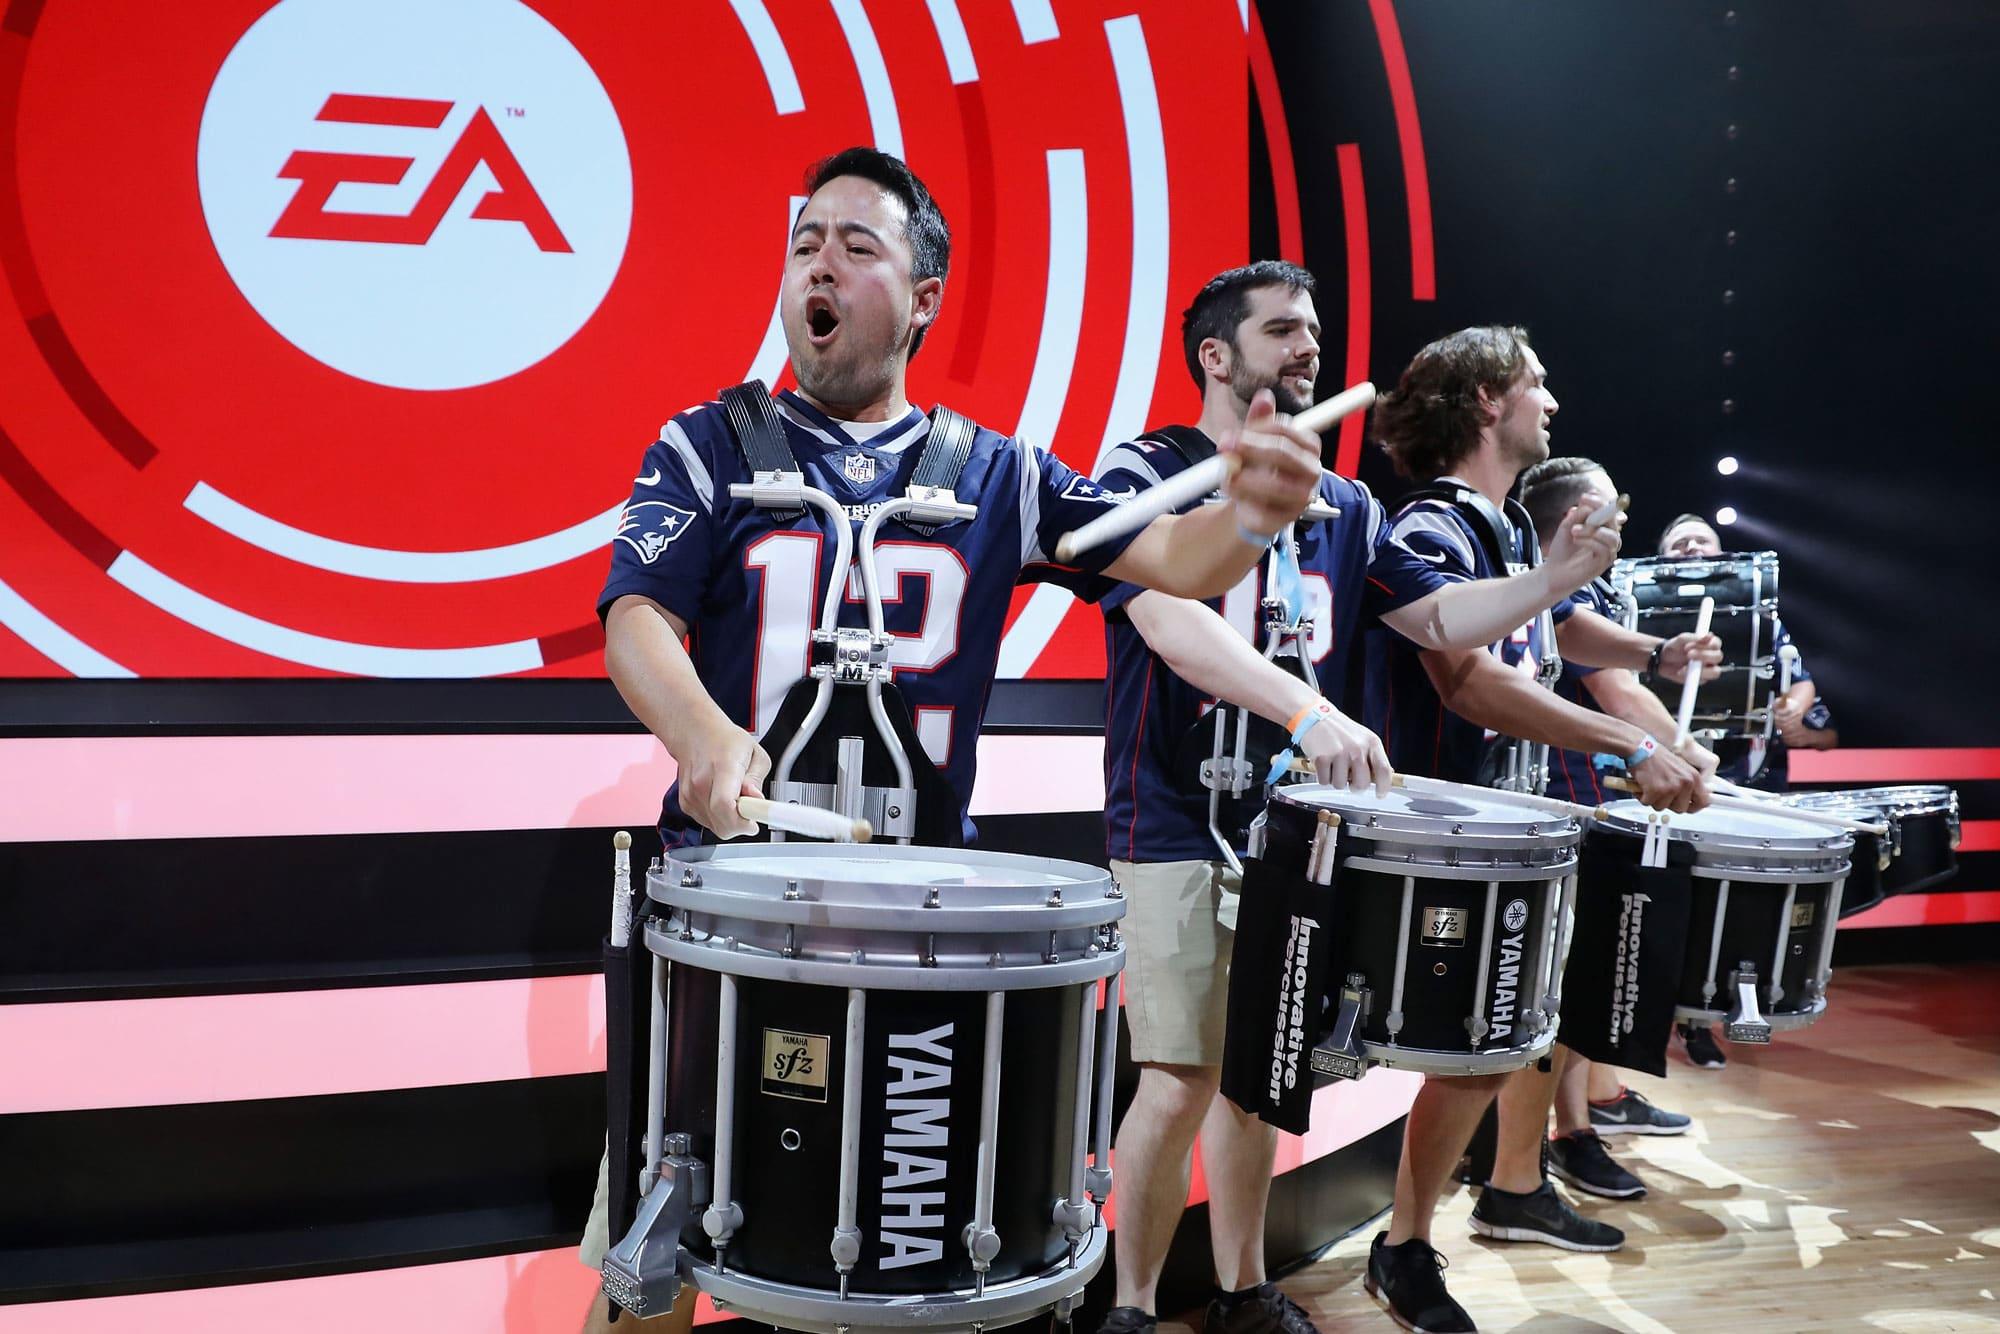 EA holiday-quarter revenue forecast misses estimates on 'Battlefield